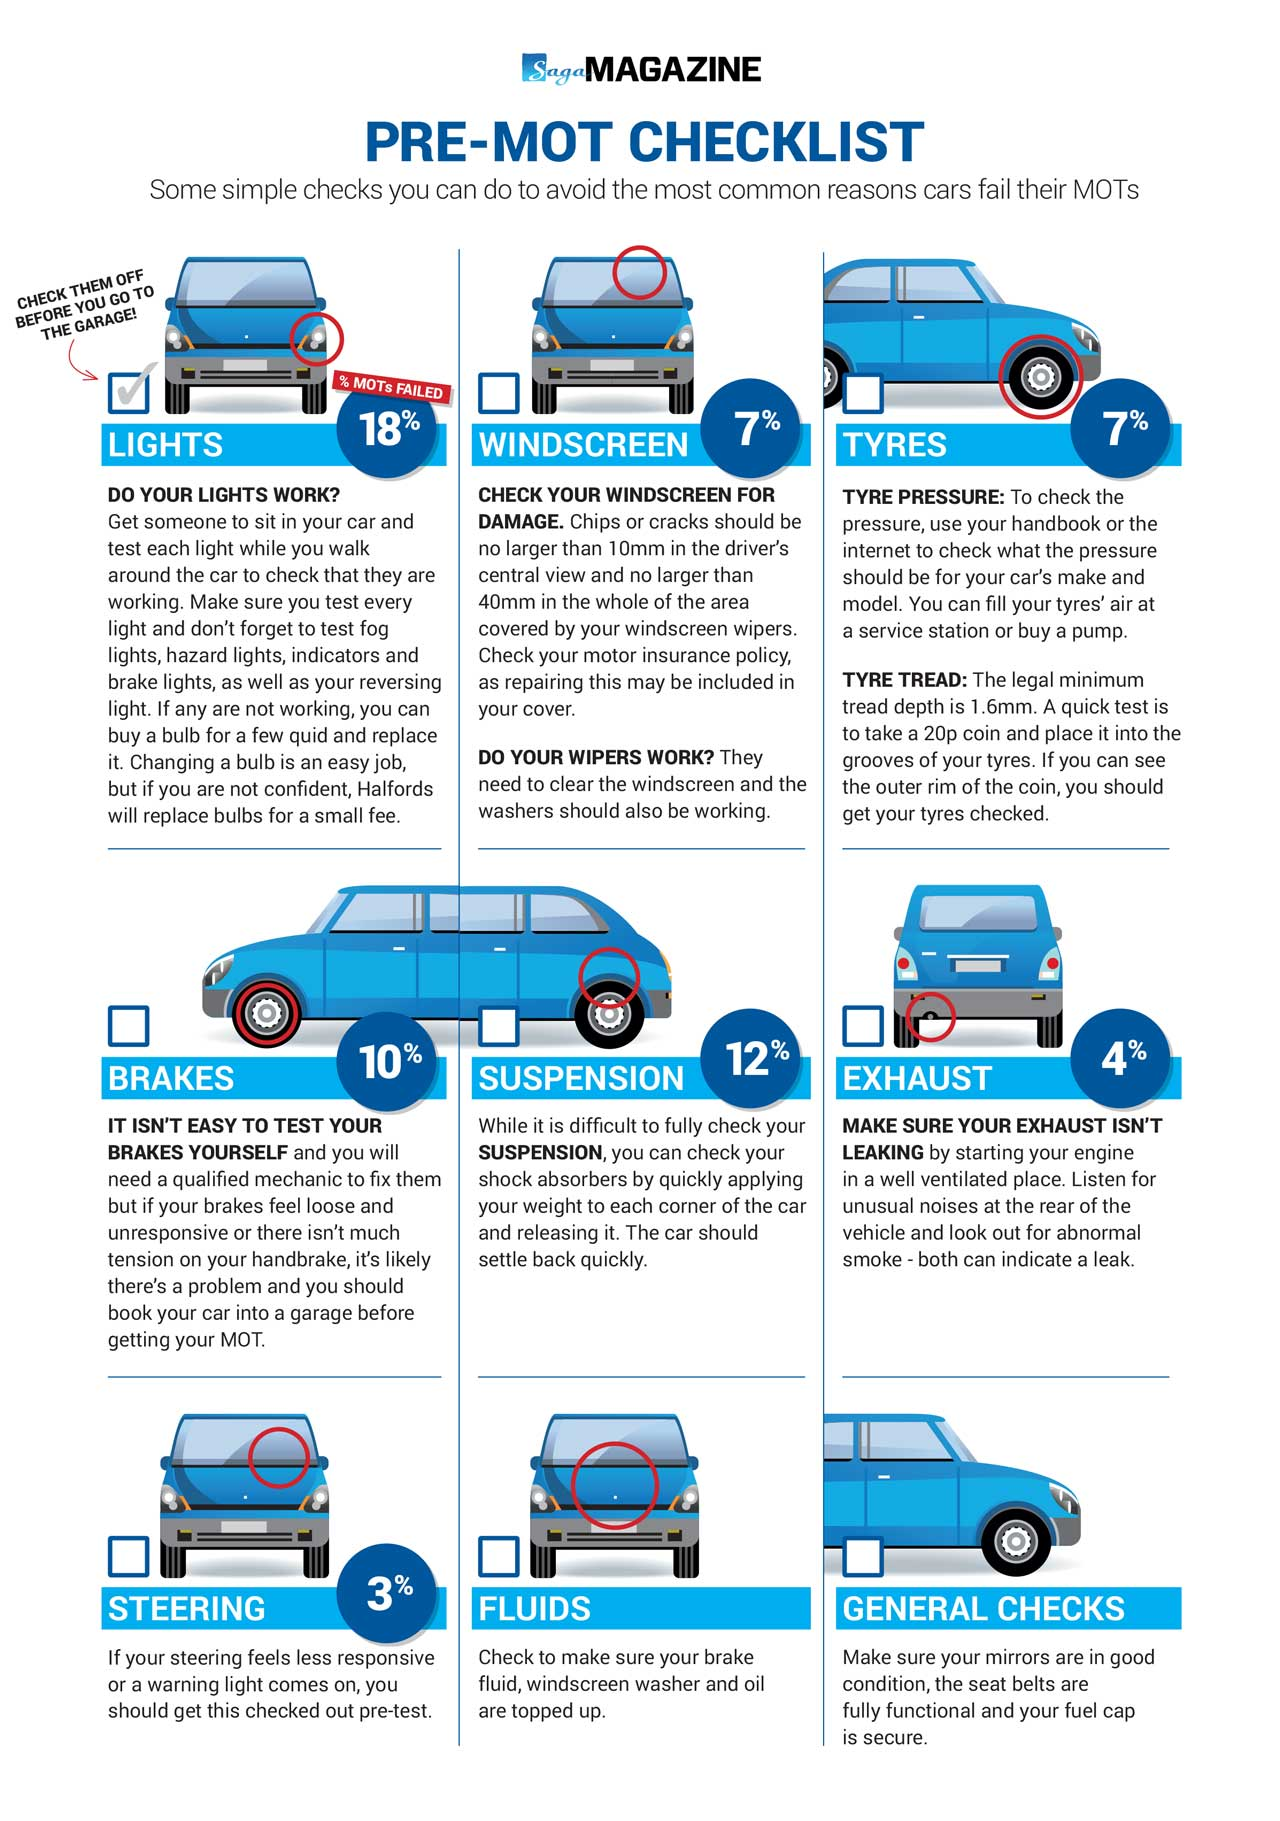 Car Maintenance Checklist >> 6 ways to beat MOT stress - Saga